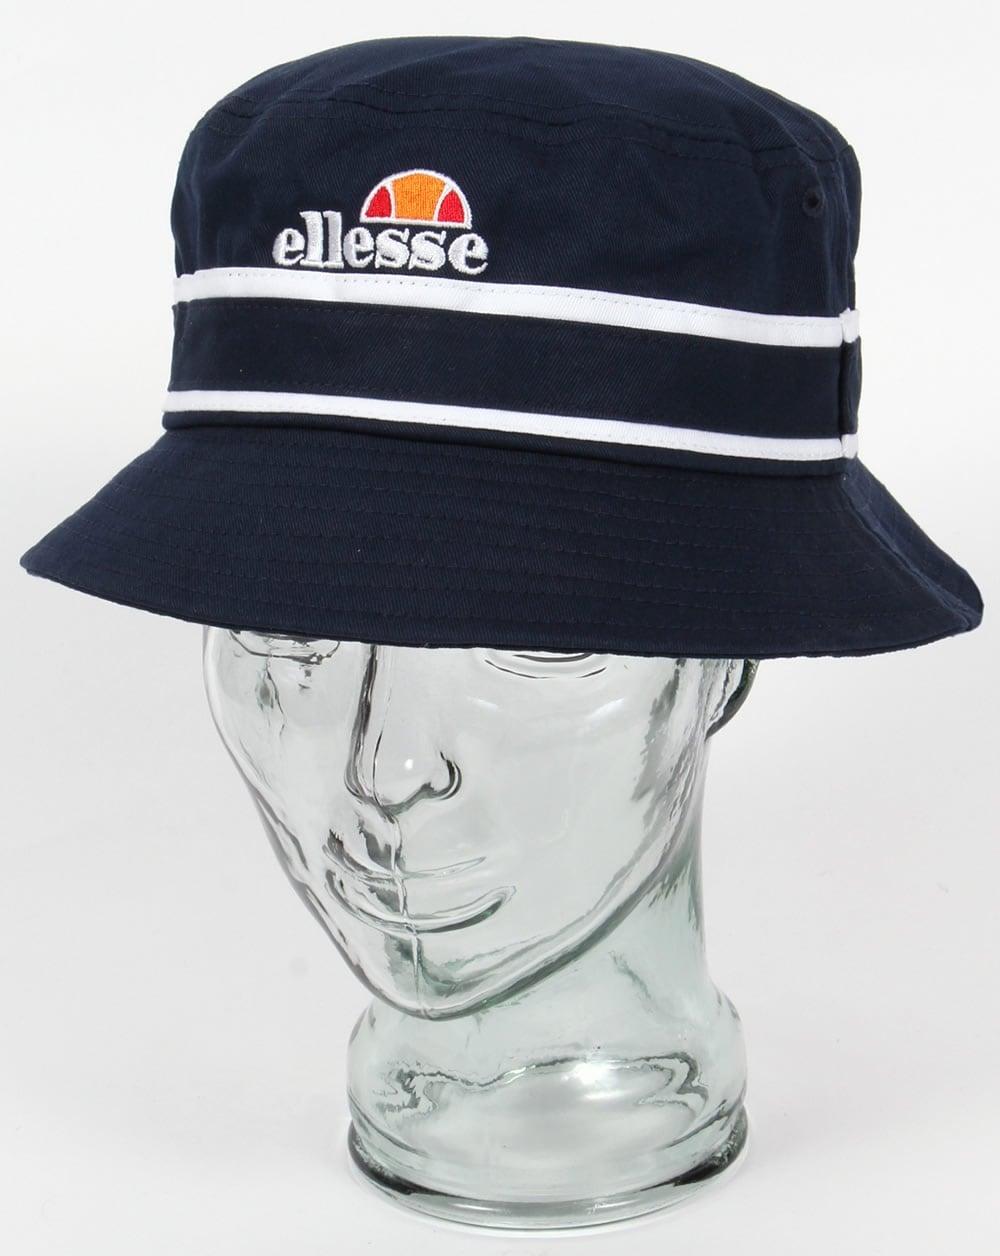 f33eb78f446 Ellesse Ellesse Veneto Bucket Hat Navy White